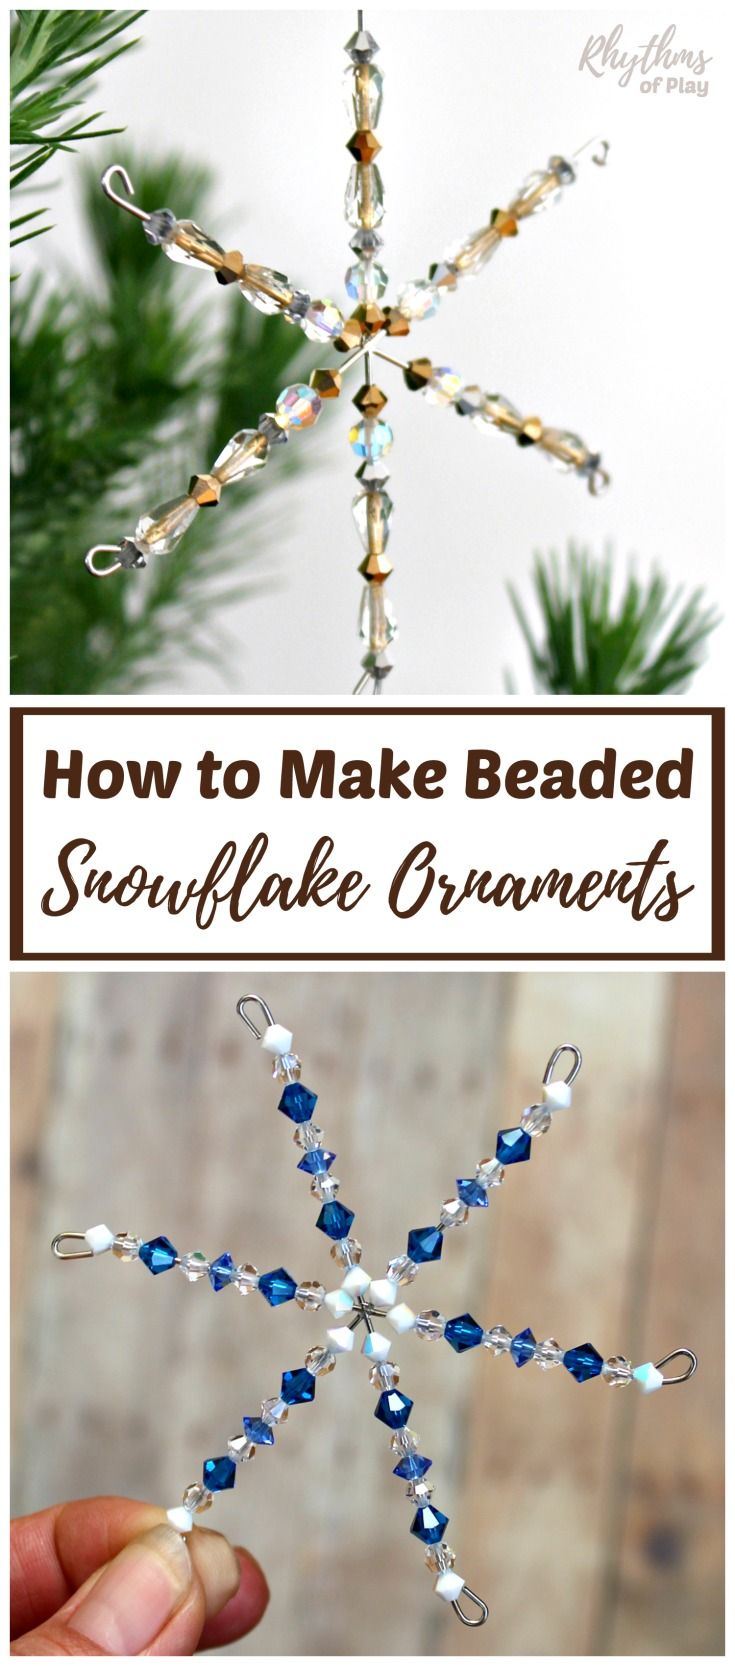 pics How to Make a Beaded Snowflake Ornament